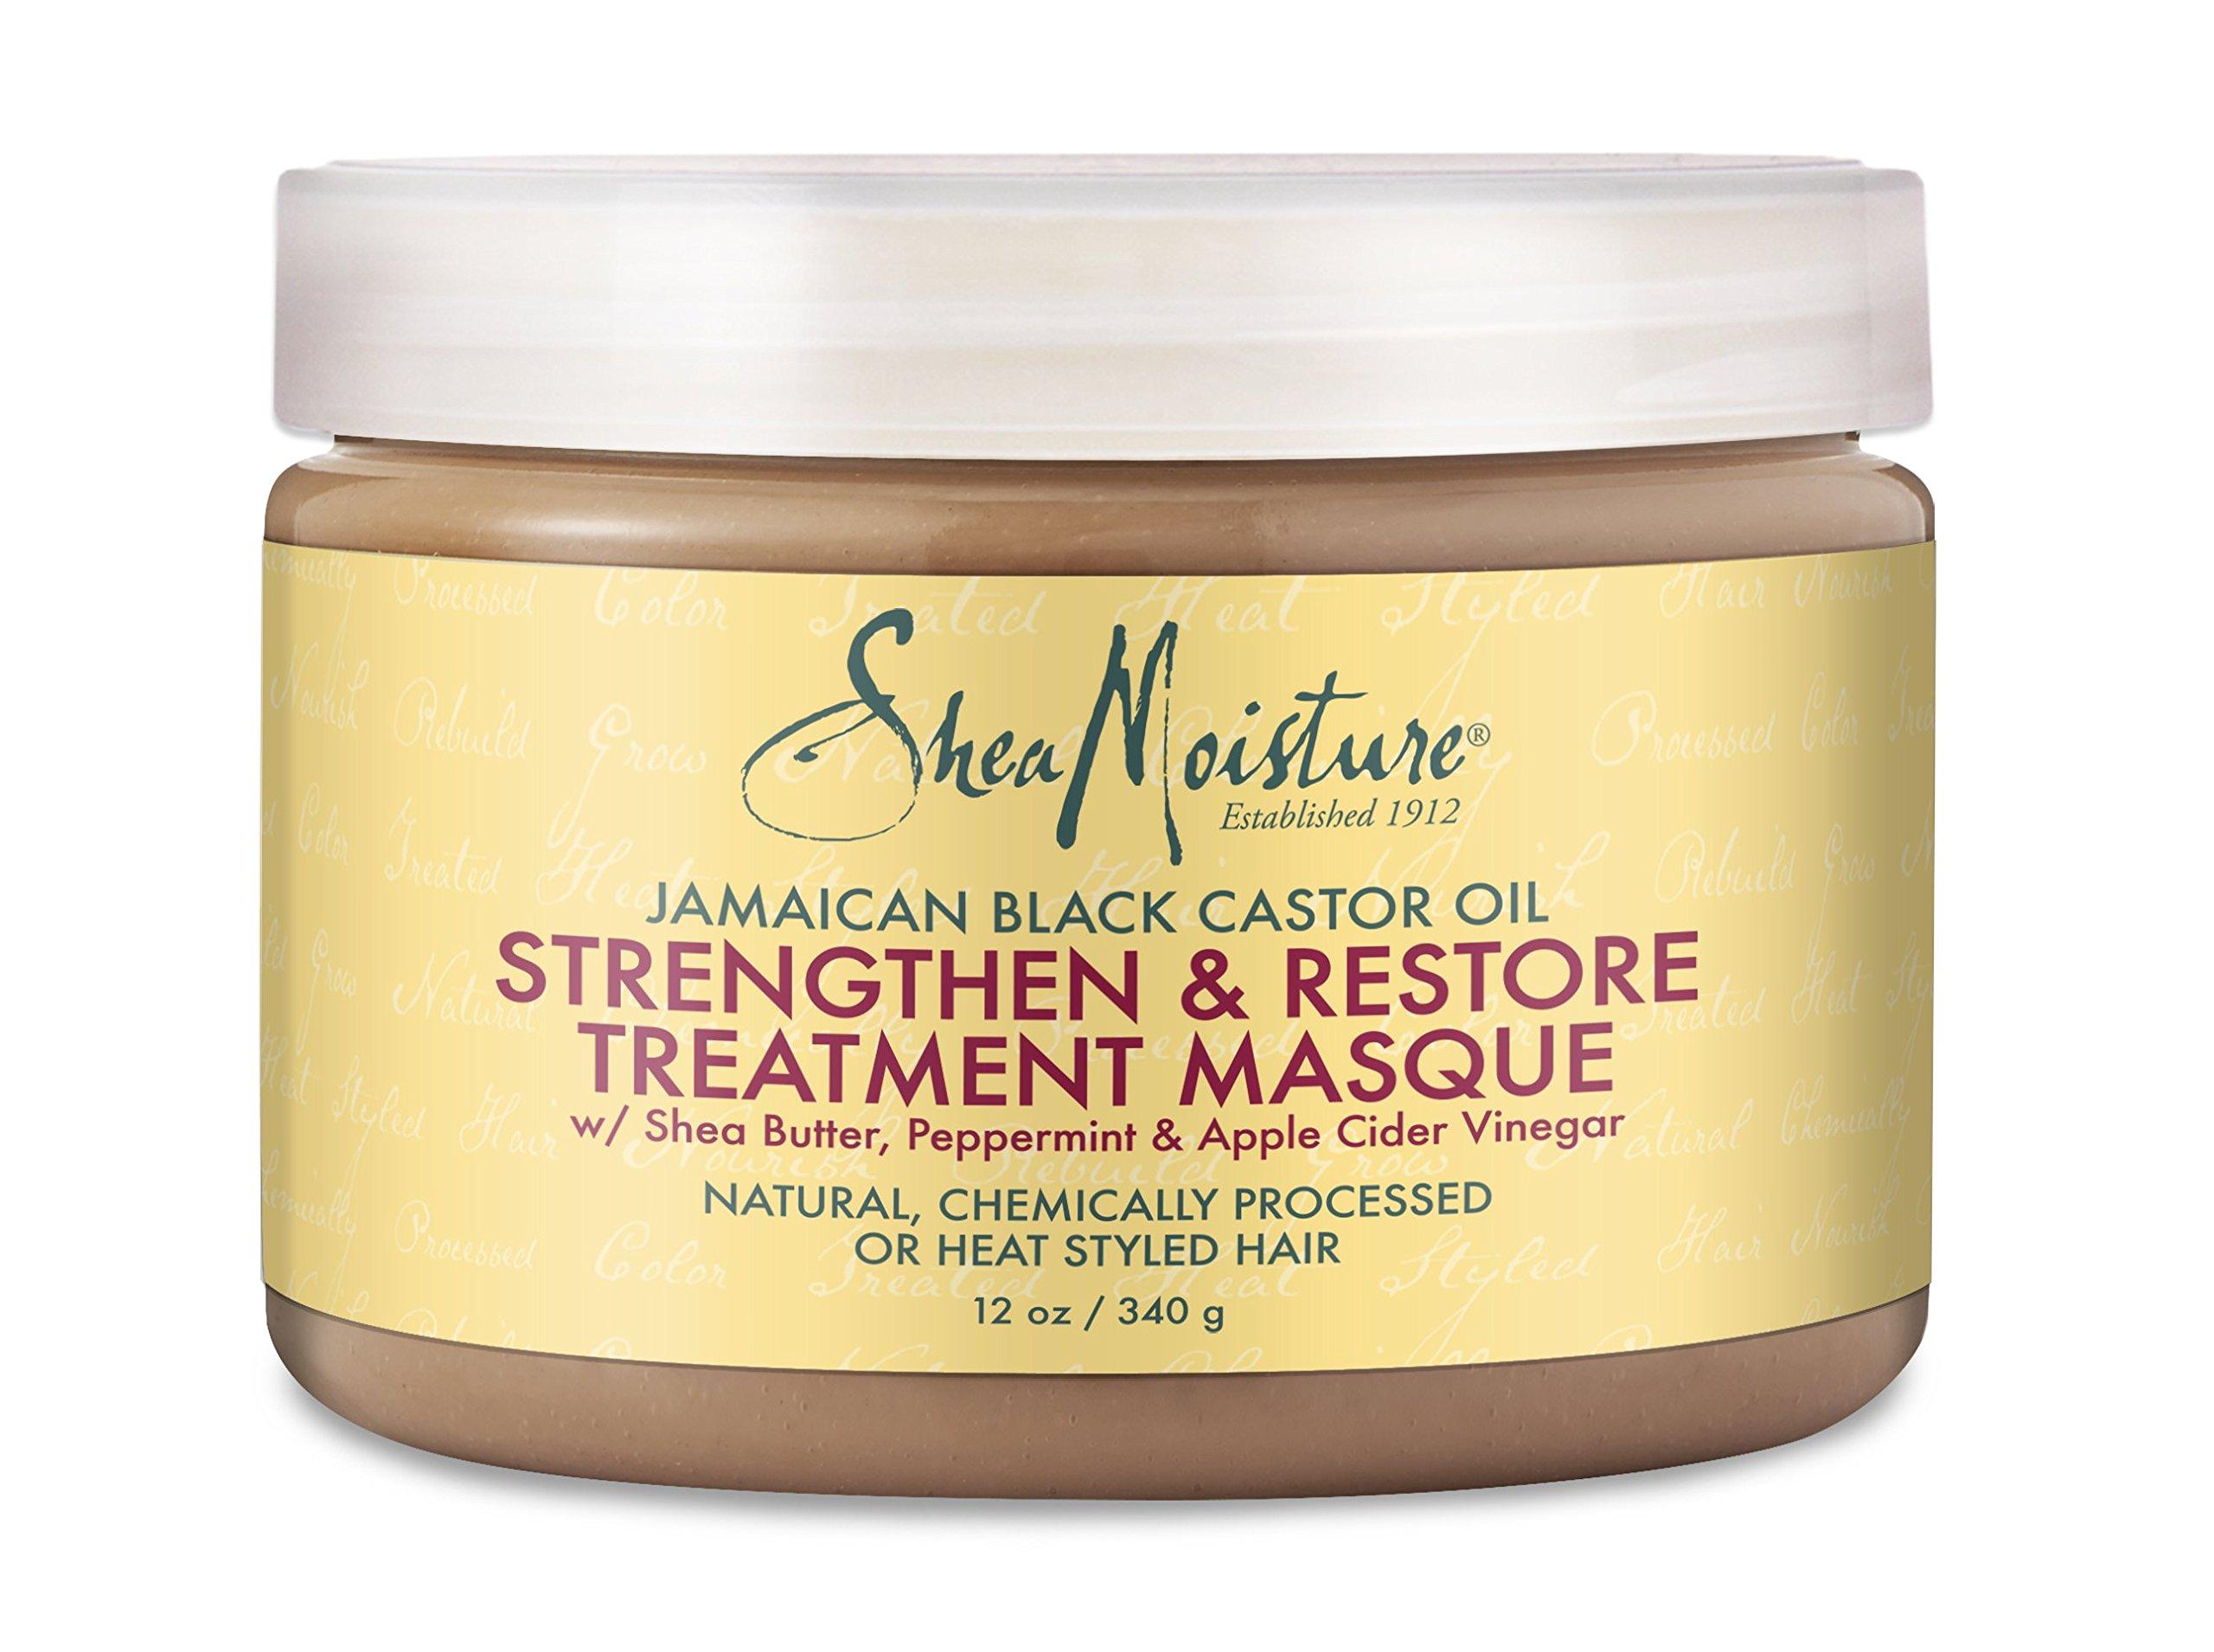 Shea Moisture Jamaican Black Castor Oil Strengthen & Restore Treatment Masque, 12 oz. by SHEA MOISTURE